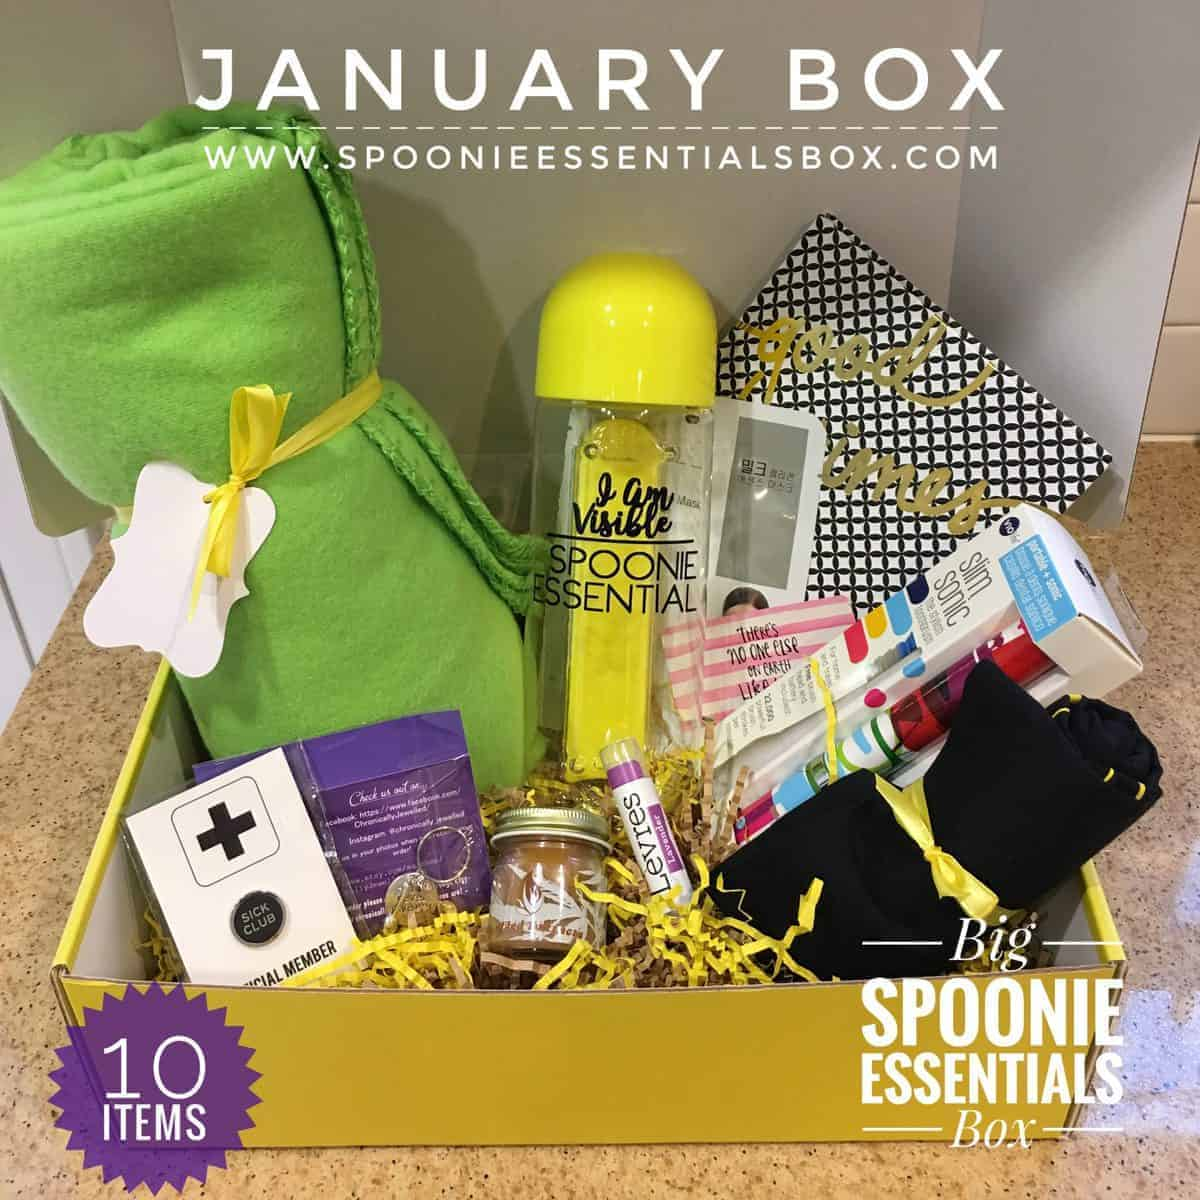 Spoonie Essentials Box